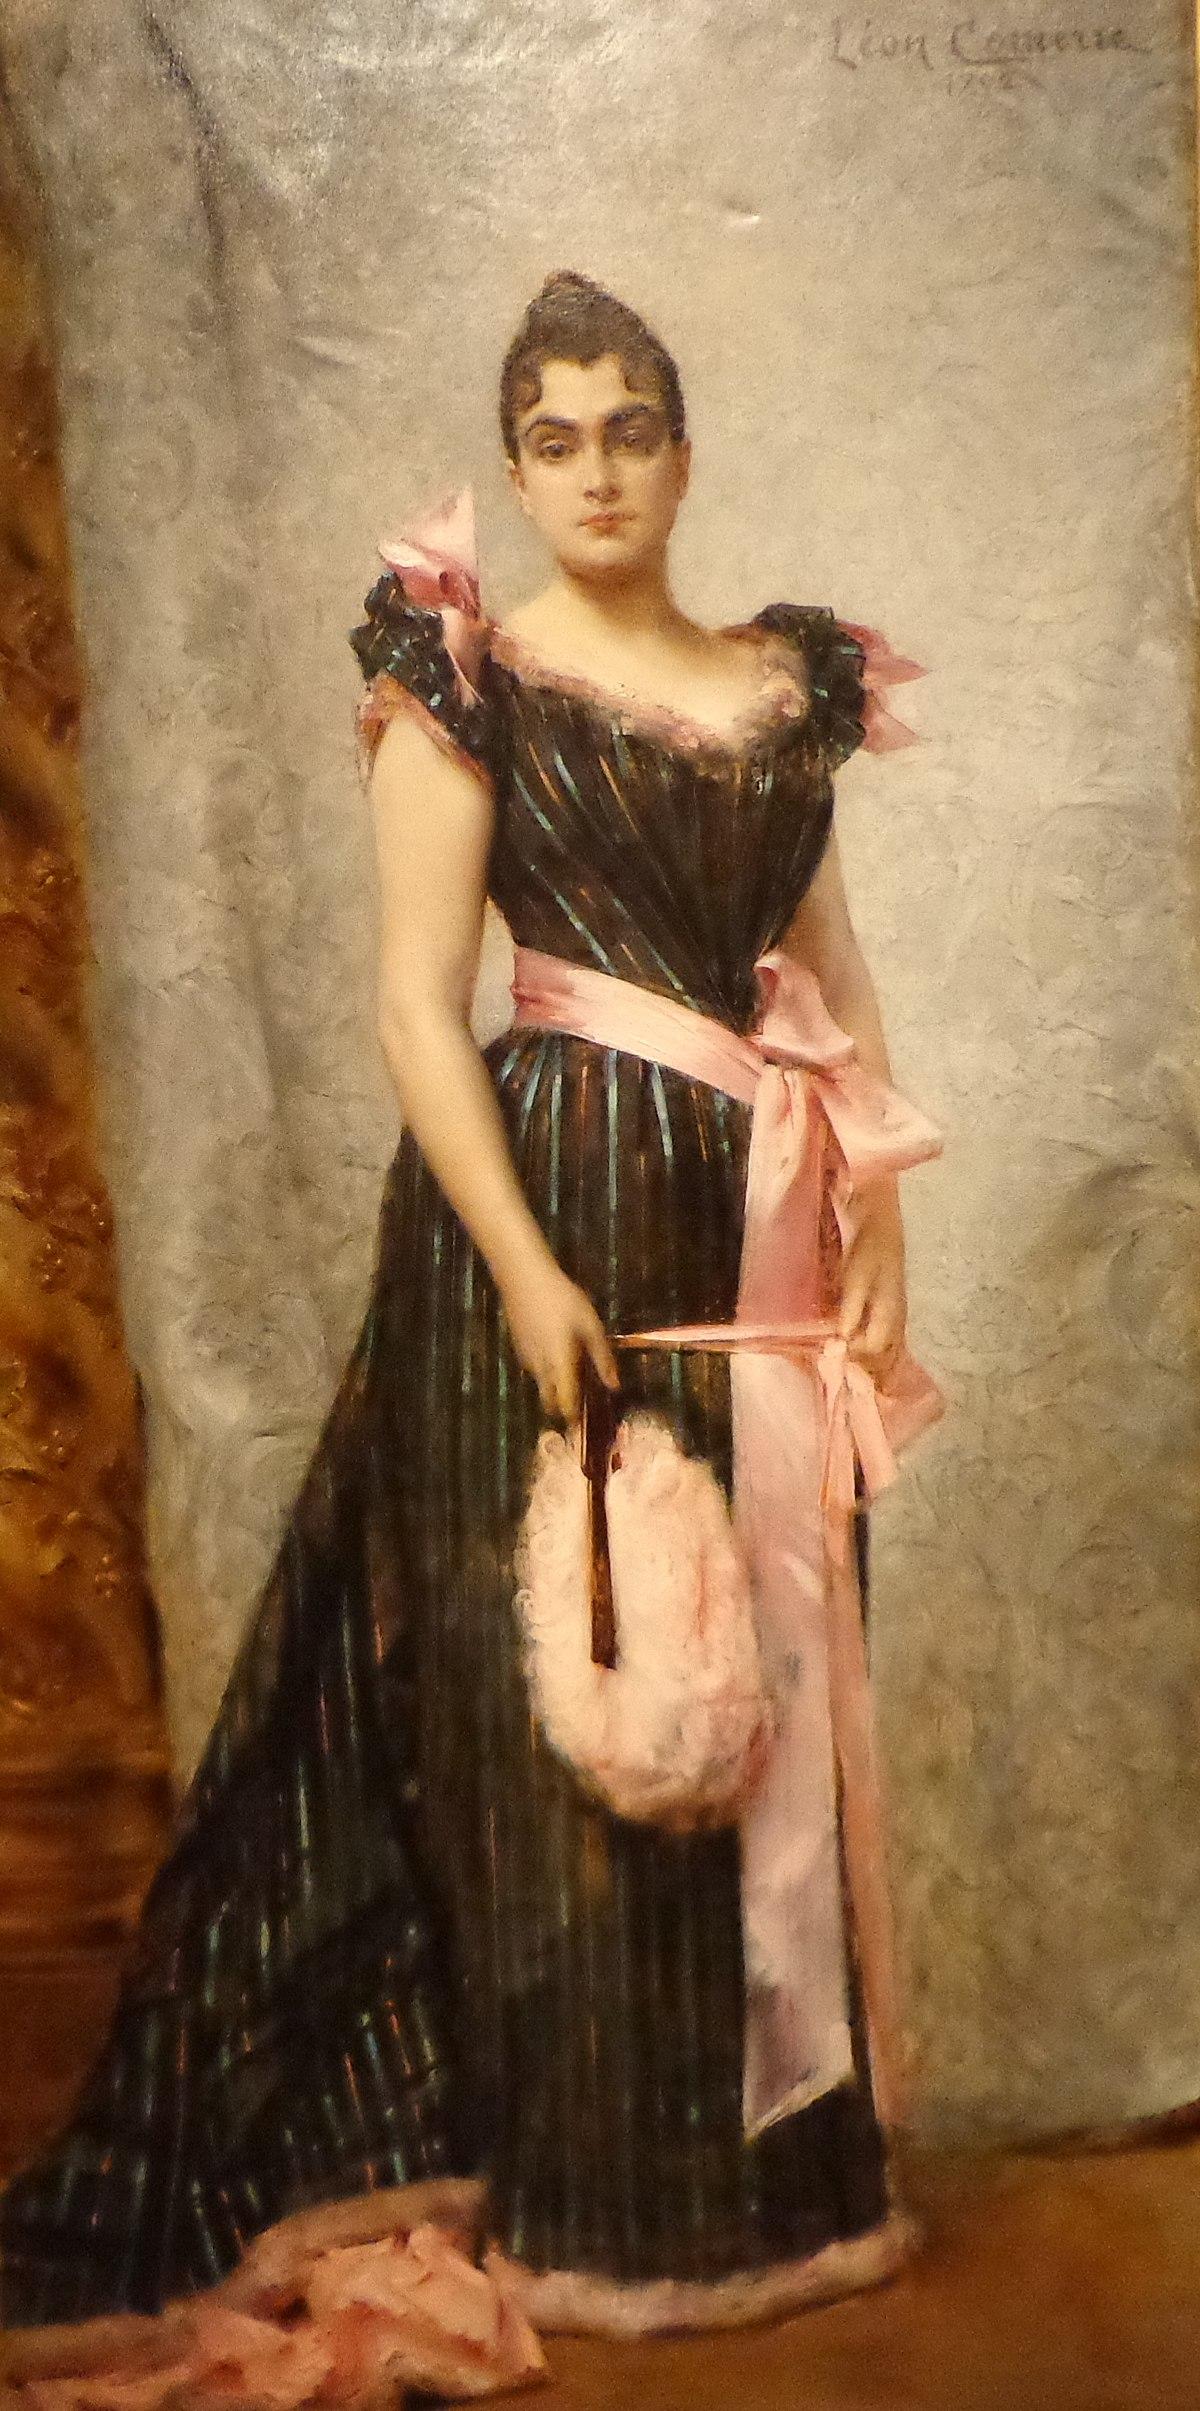 La Femme De L Artiste : femme, artiste, Fichier:Comerre,, Portrait, Femme, L'artiste,, StrasbourgMAMCS, (2).JPG, Wikipédia